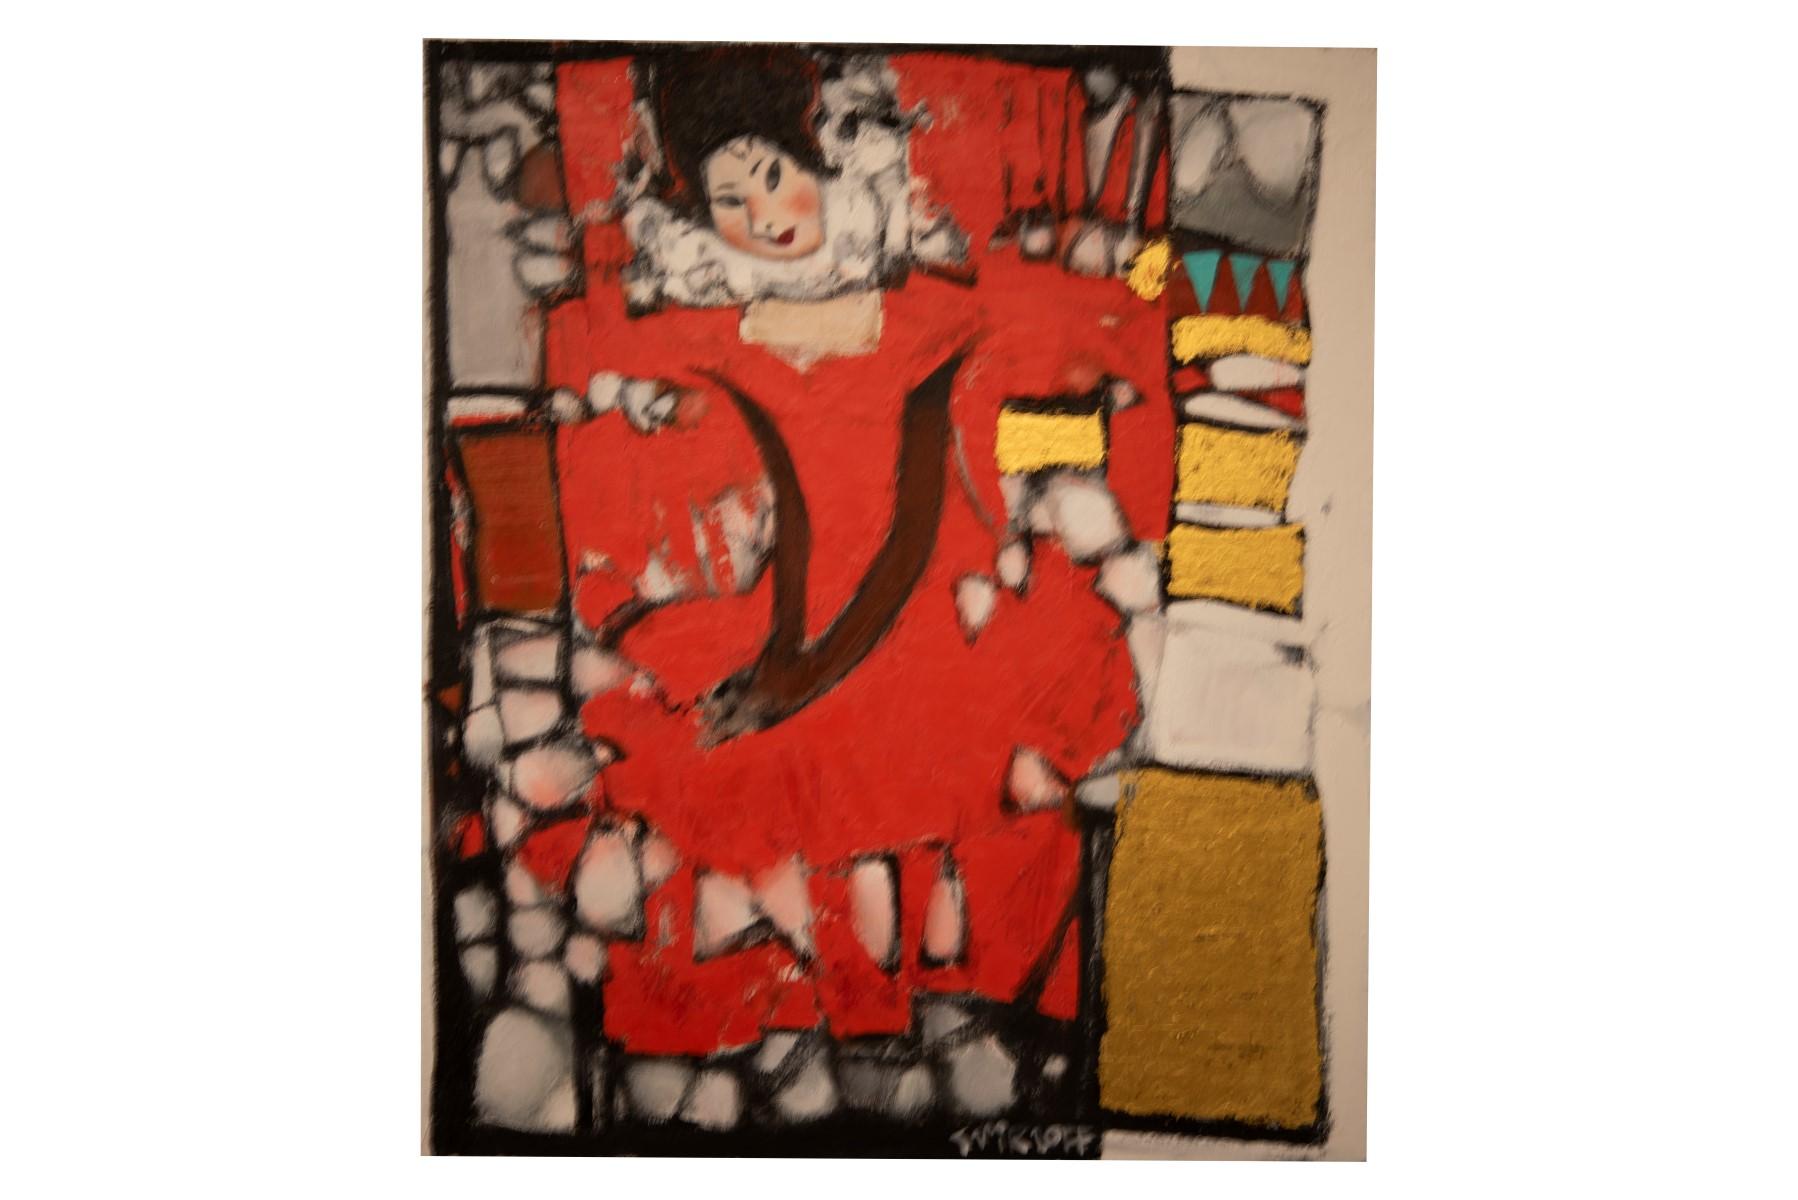 #180 Andrai Smirnoff (1960), Ruby | Andrai Smirnoff (1960), Ruby Image